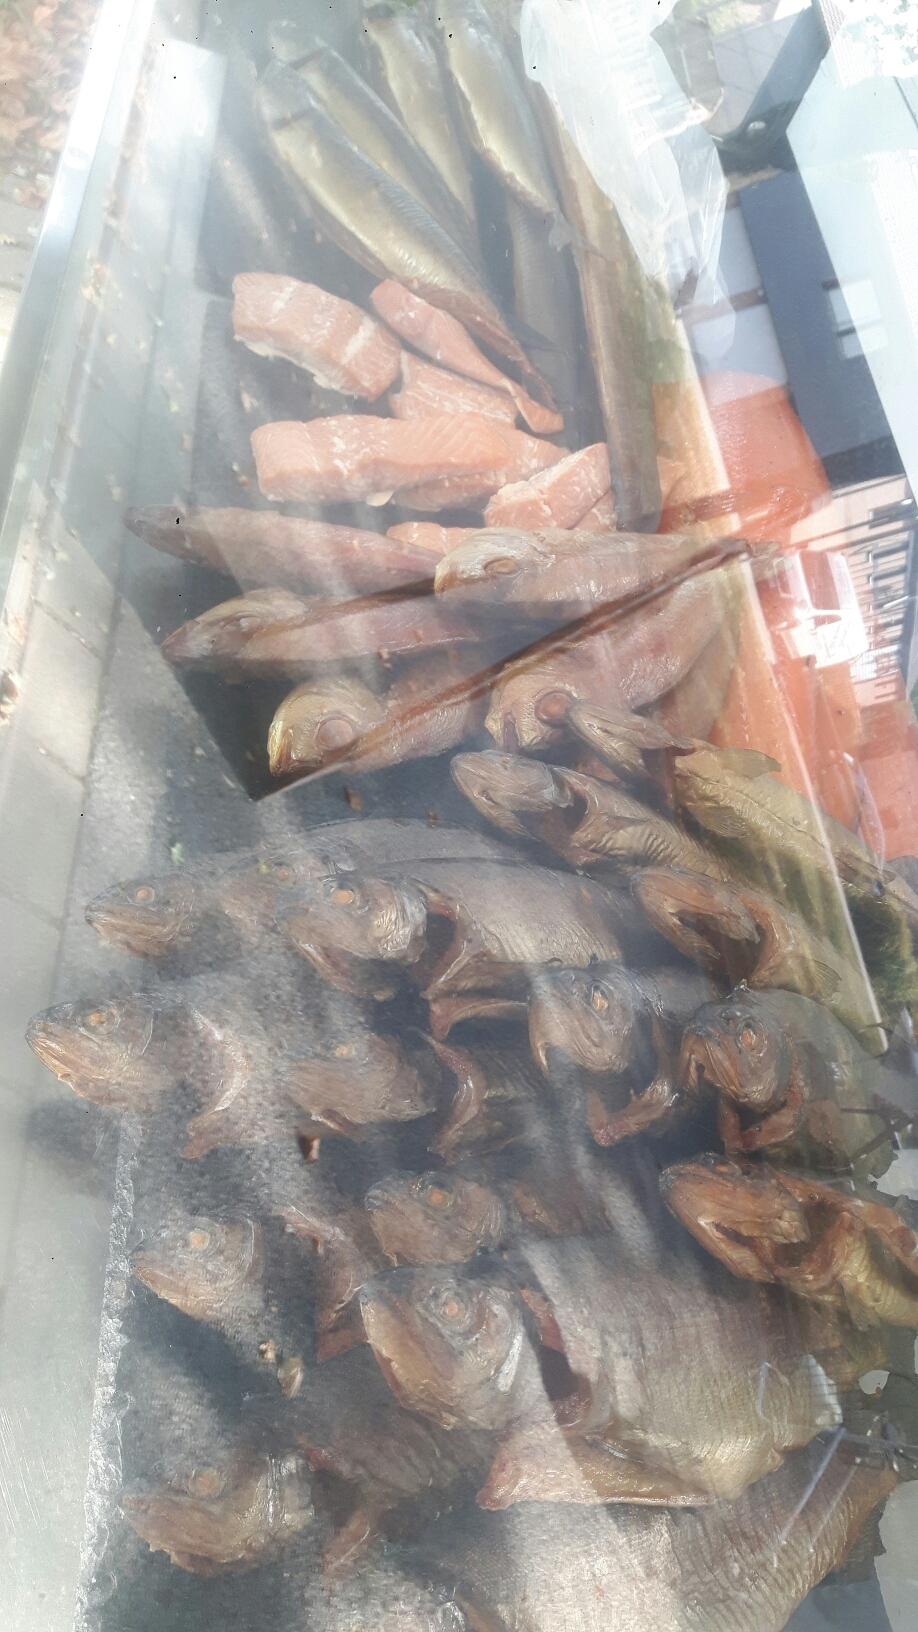 Forellen Lachs Makrele oder Dorade